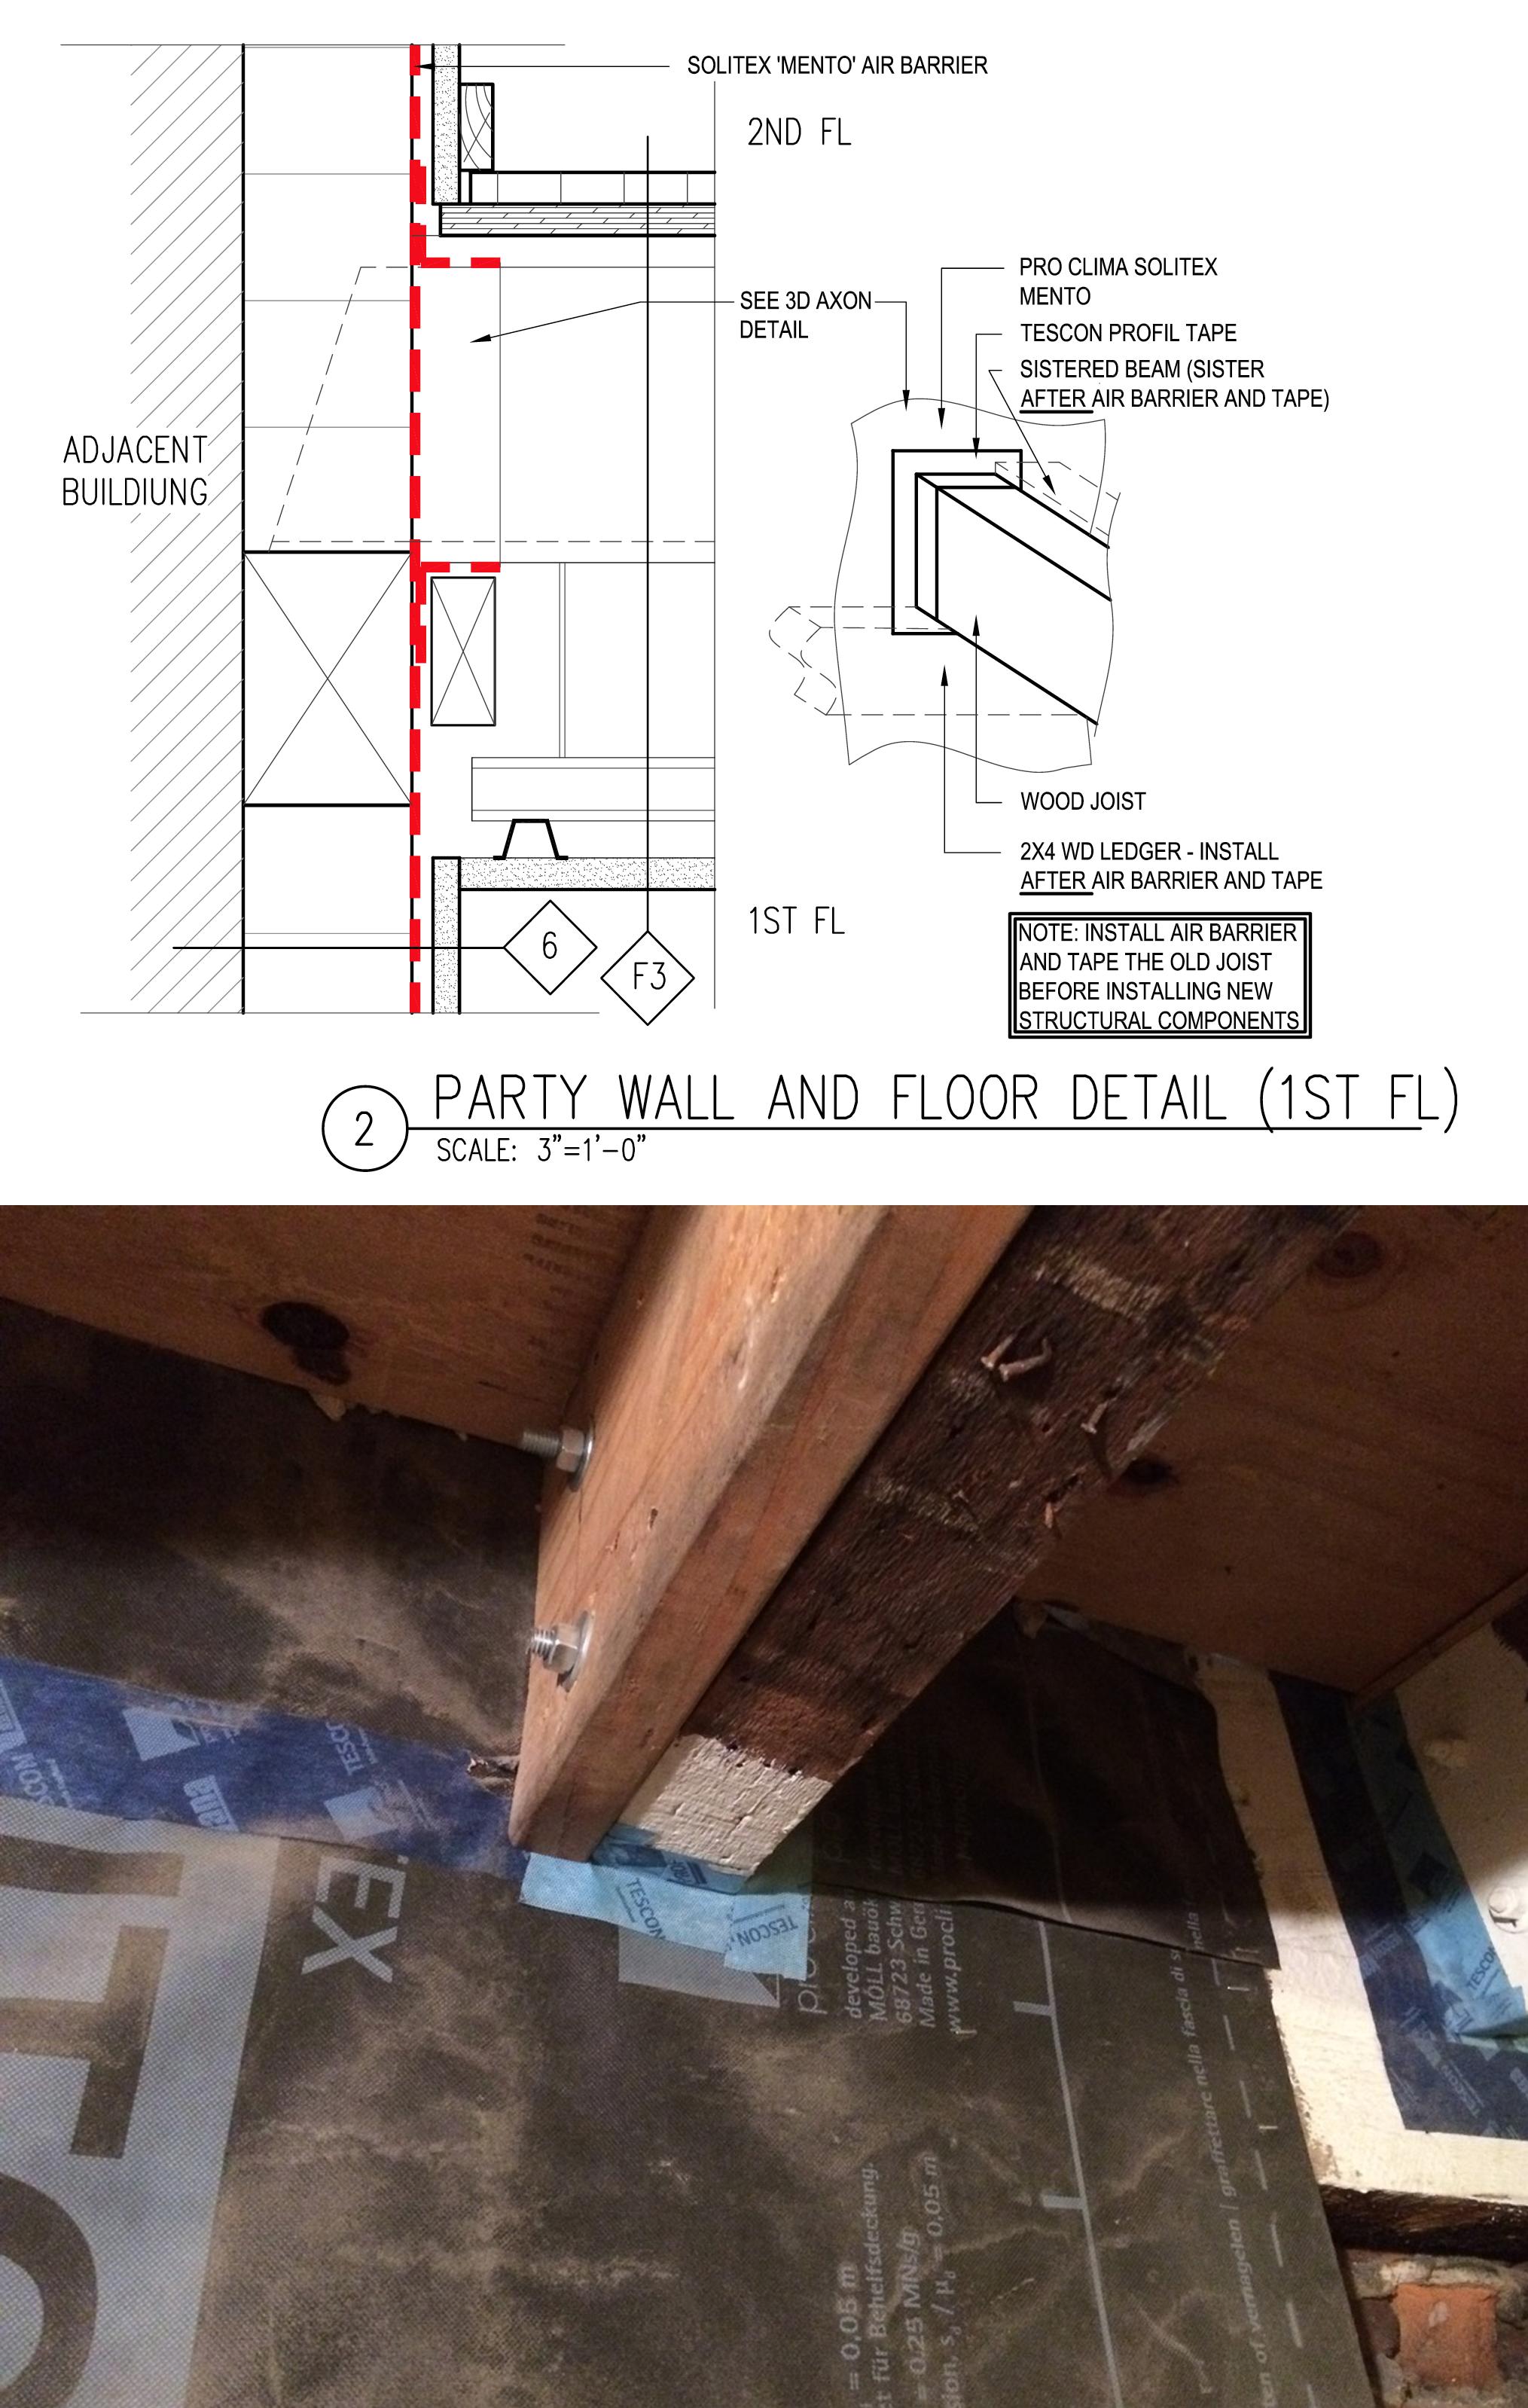 Detail drawing courtesy Paul Castrucci Architect